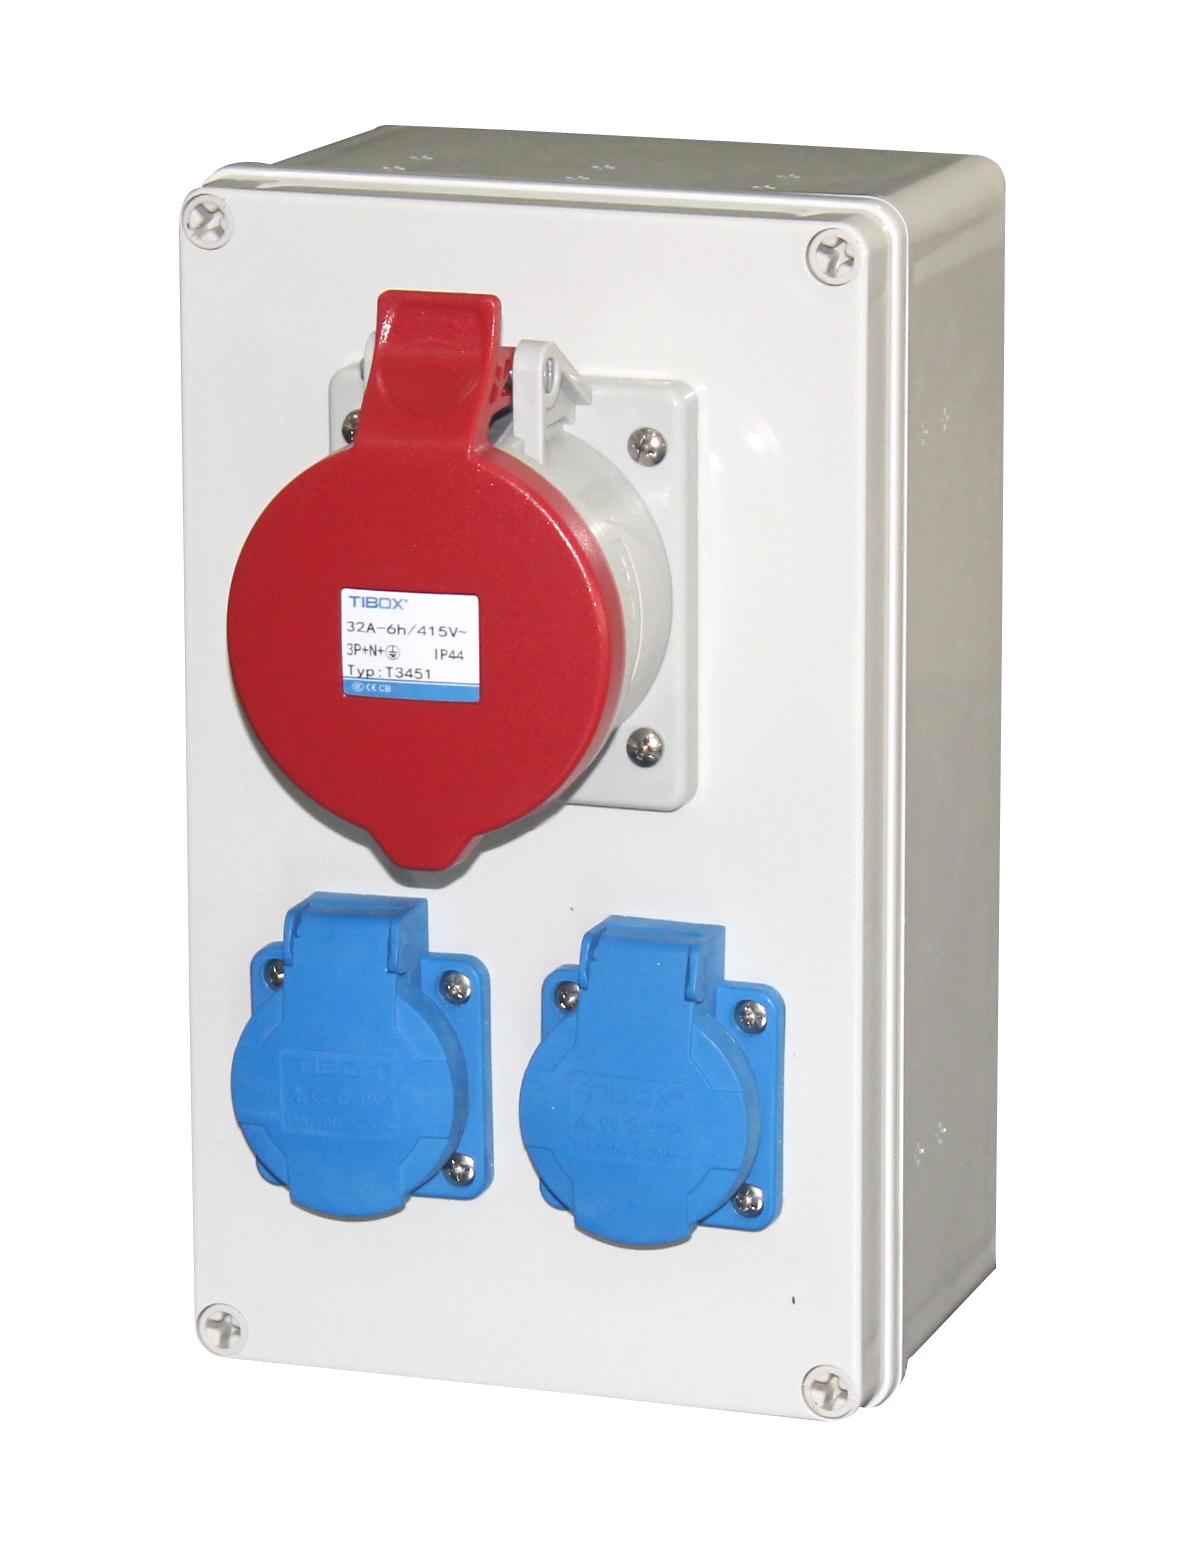 TIBOX工业插头插座防护等级是多少?